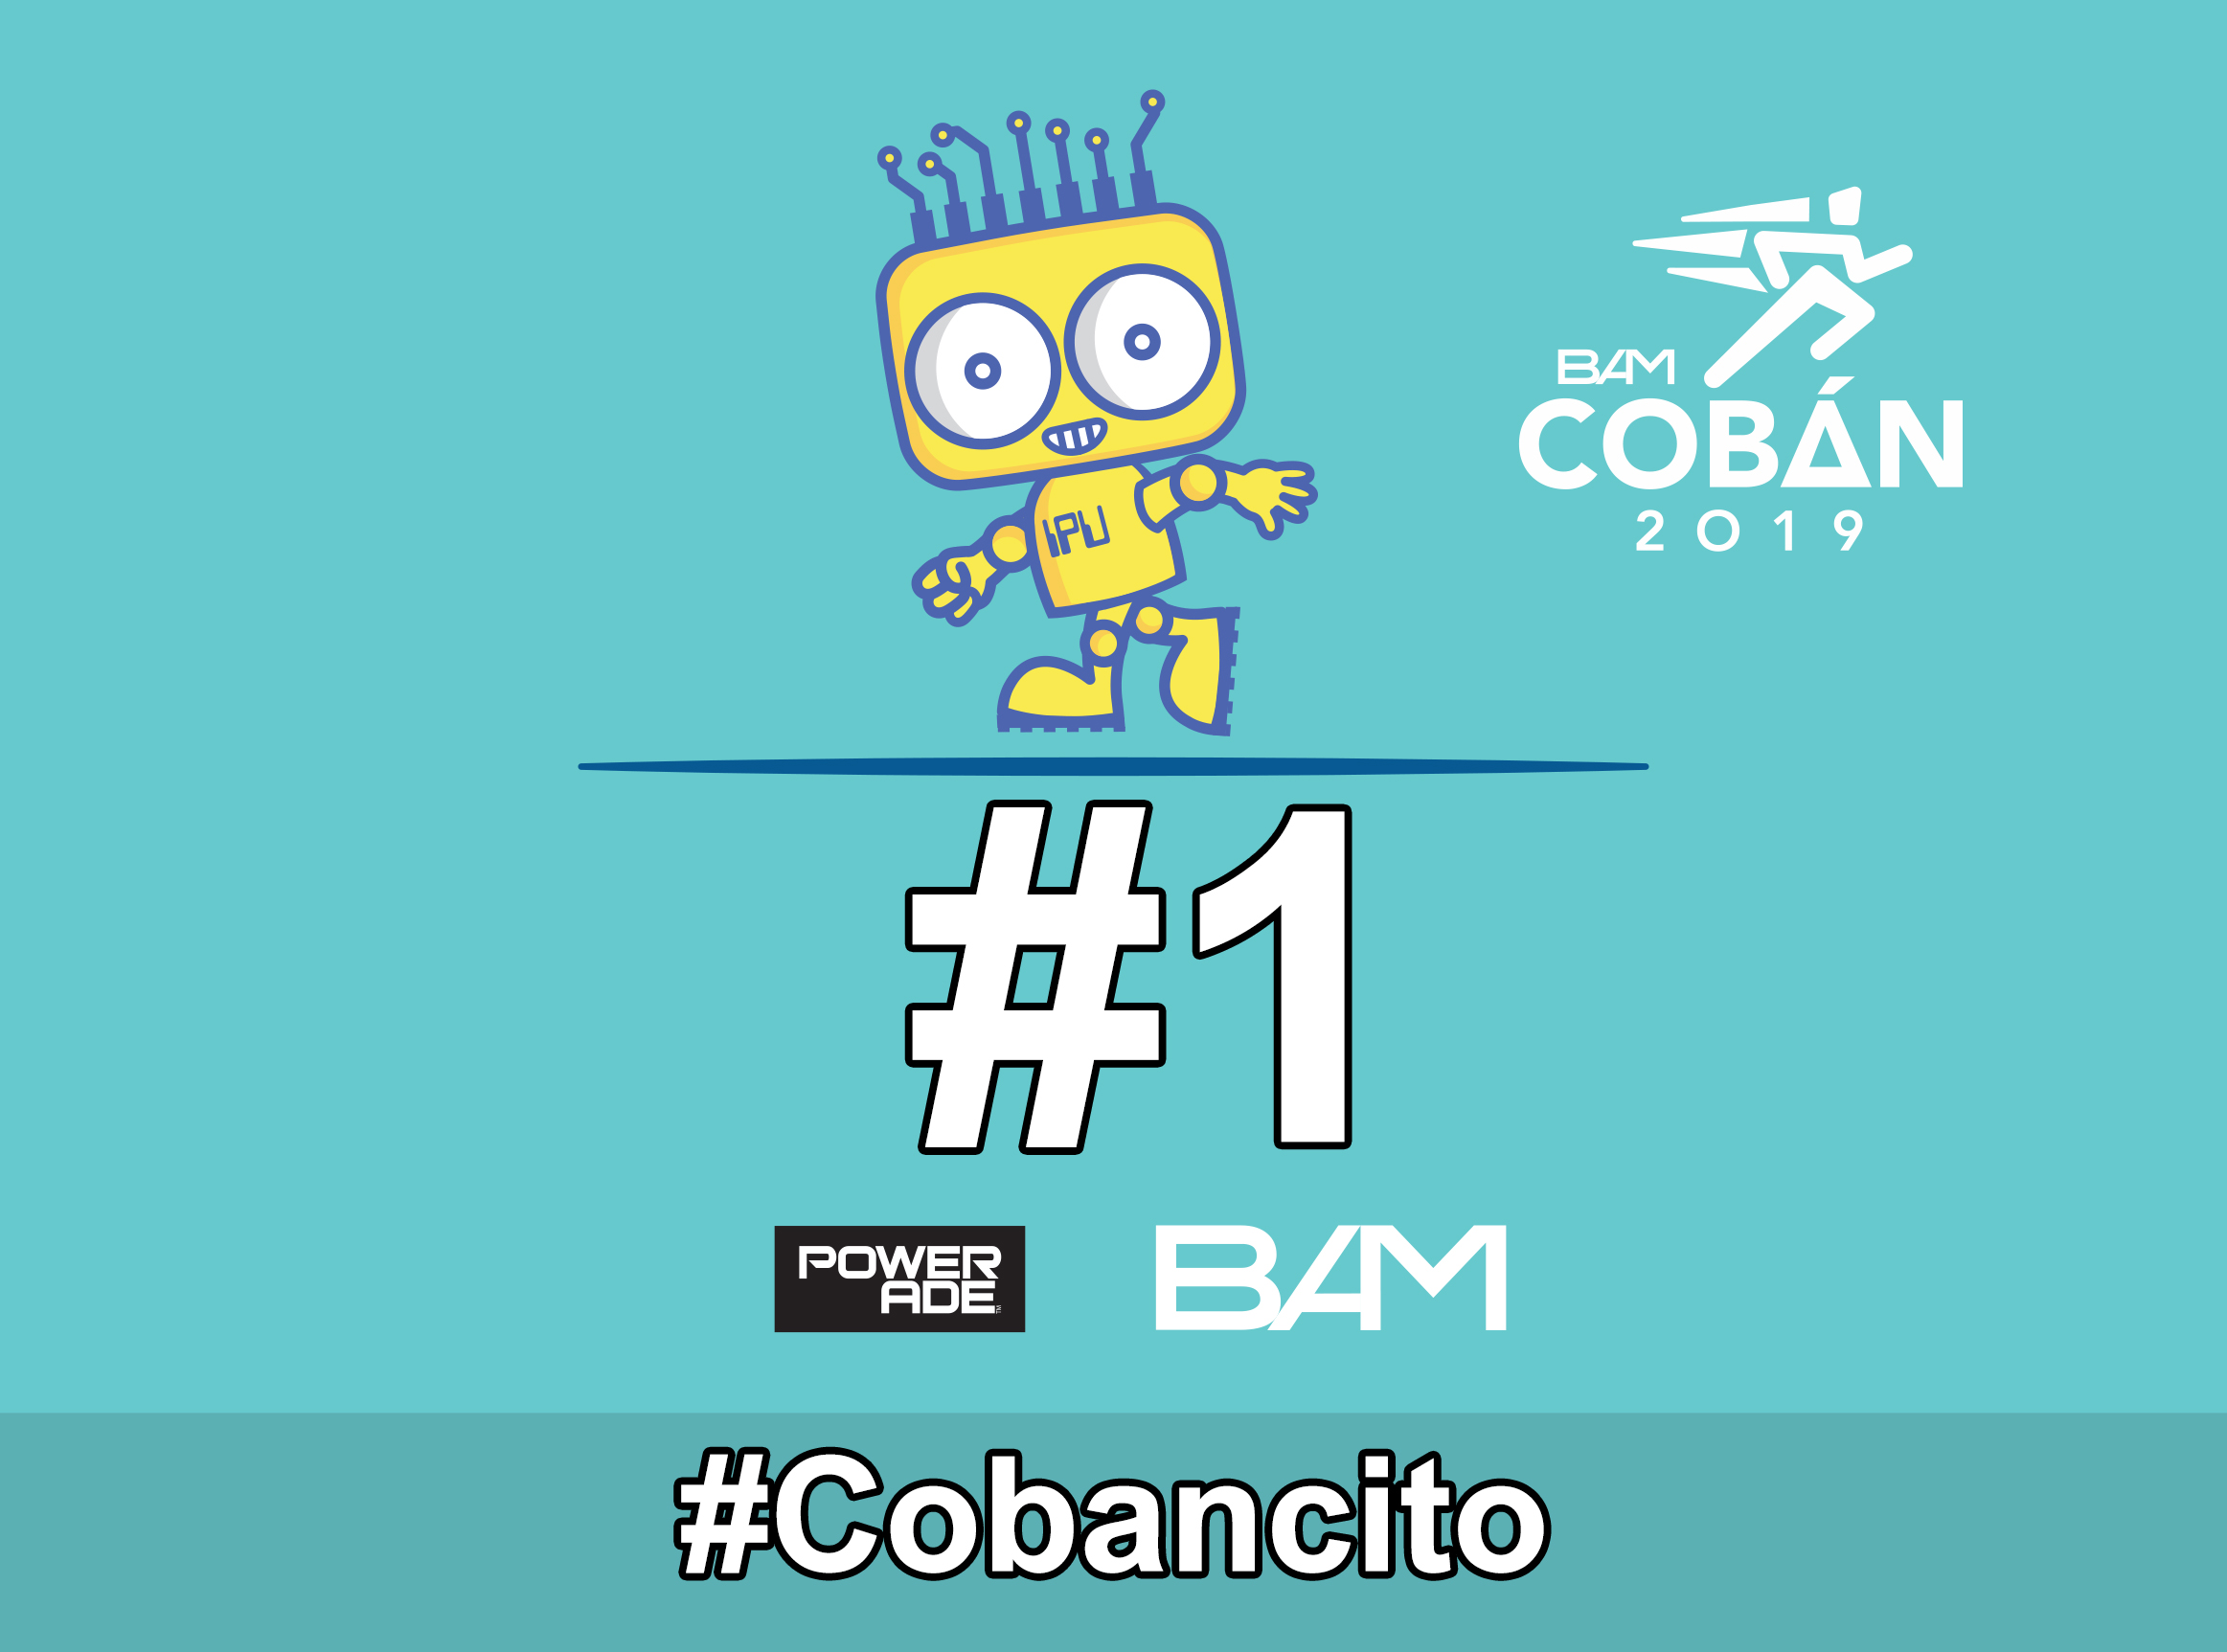 CARRERA #COBANCITO2019